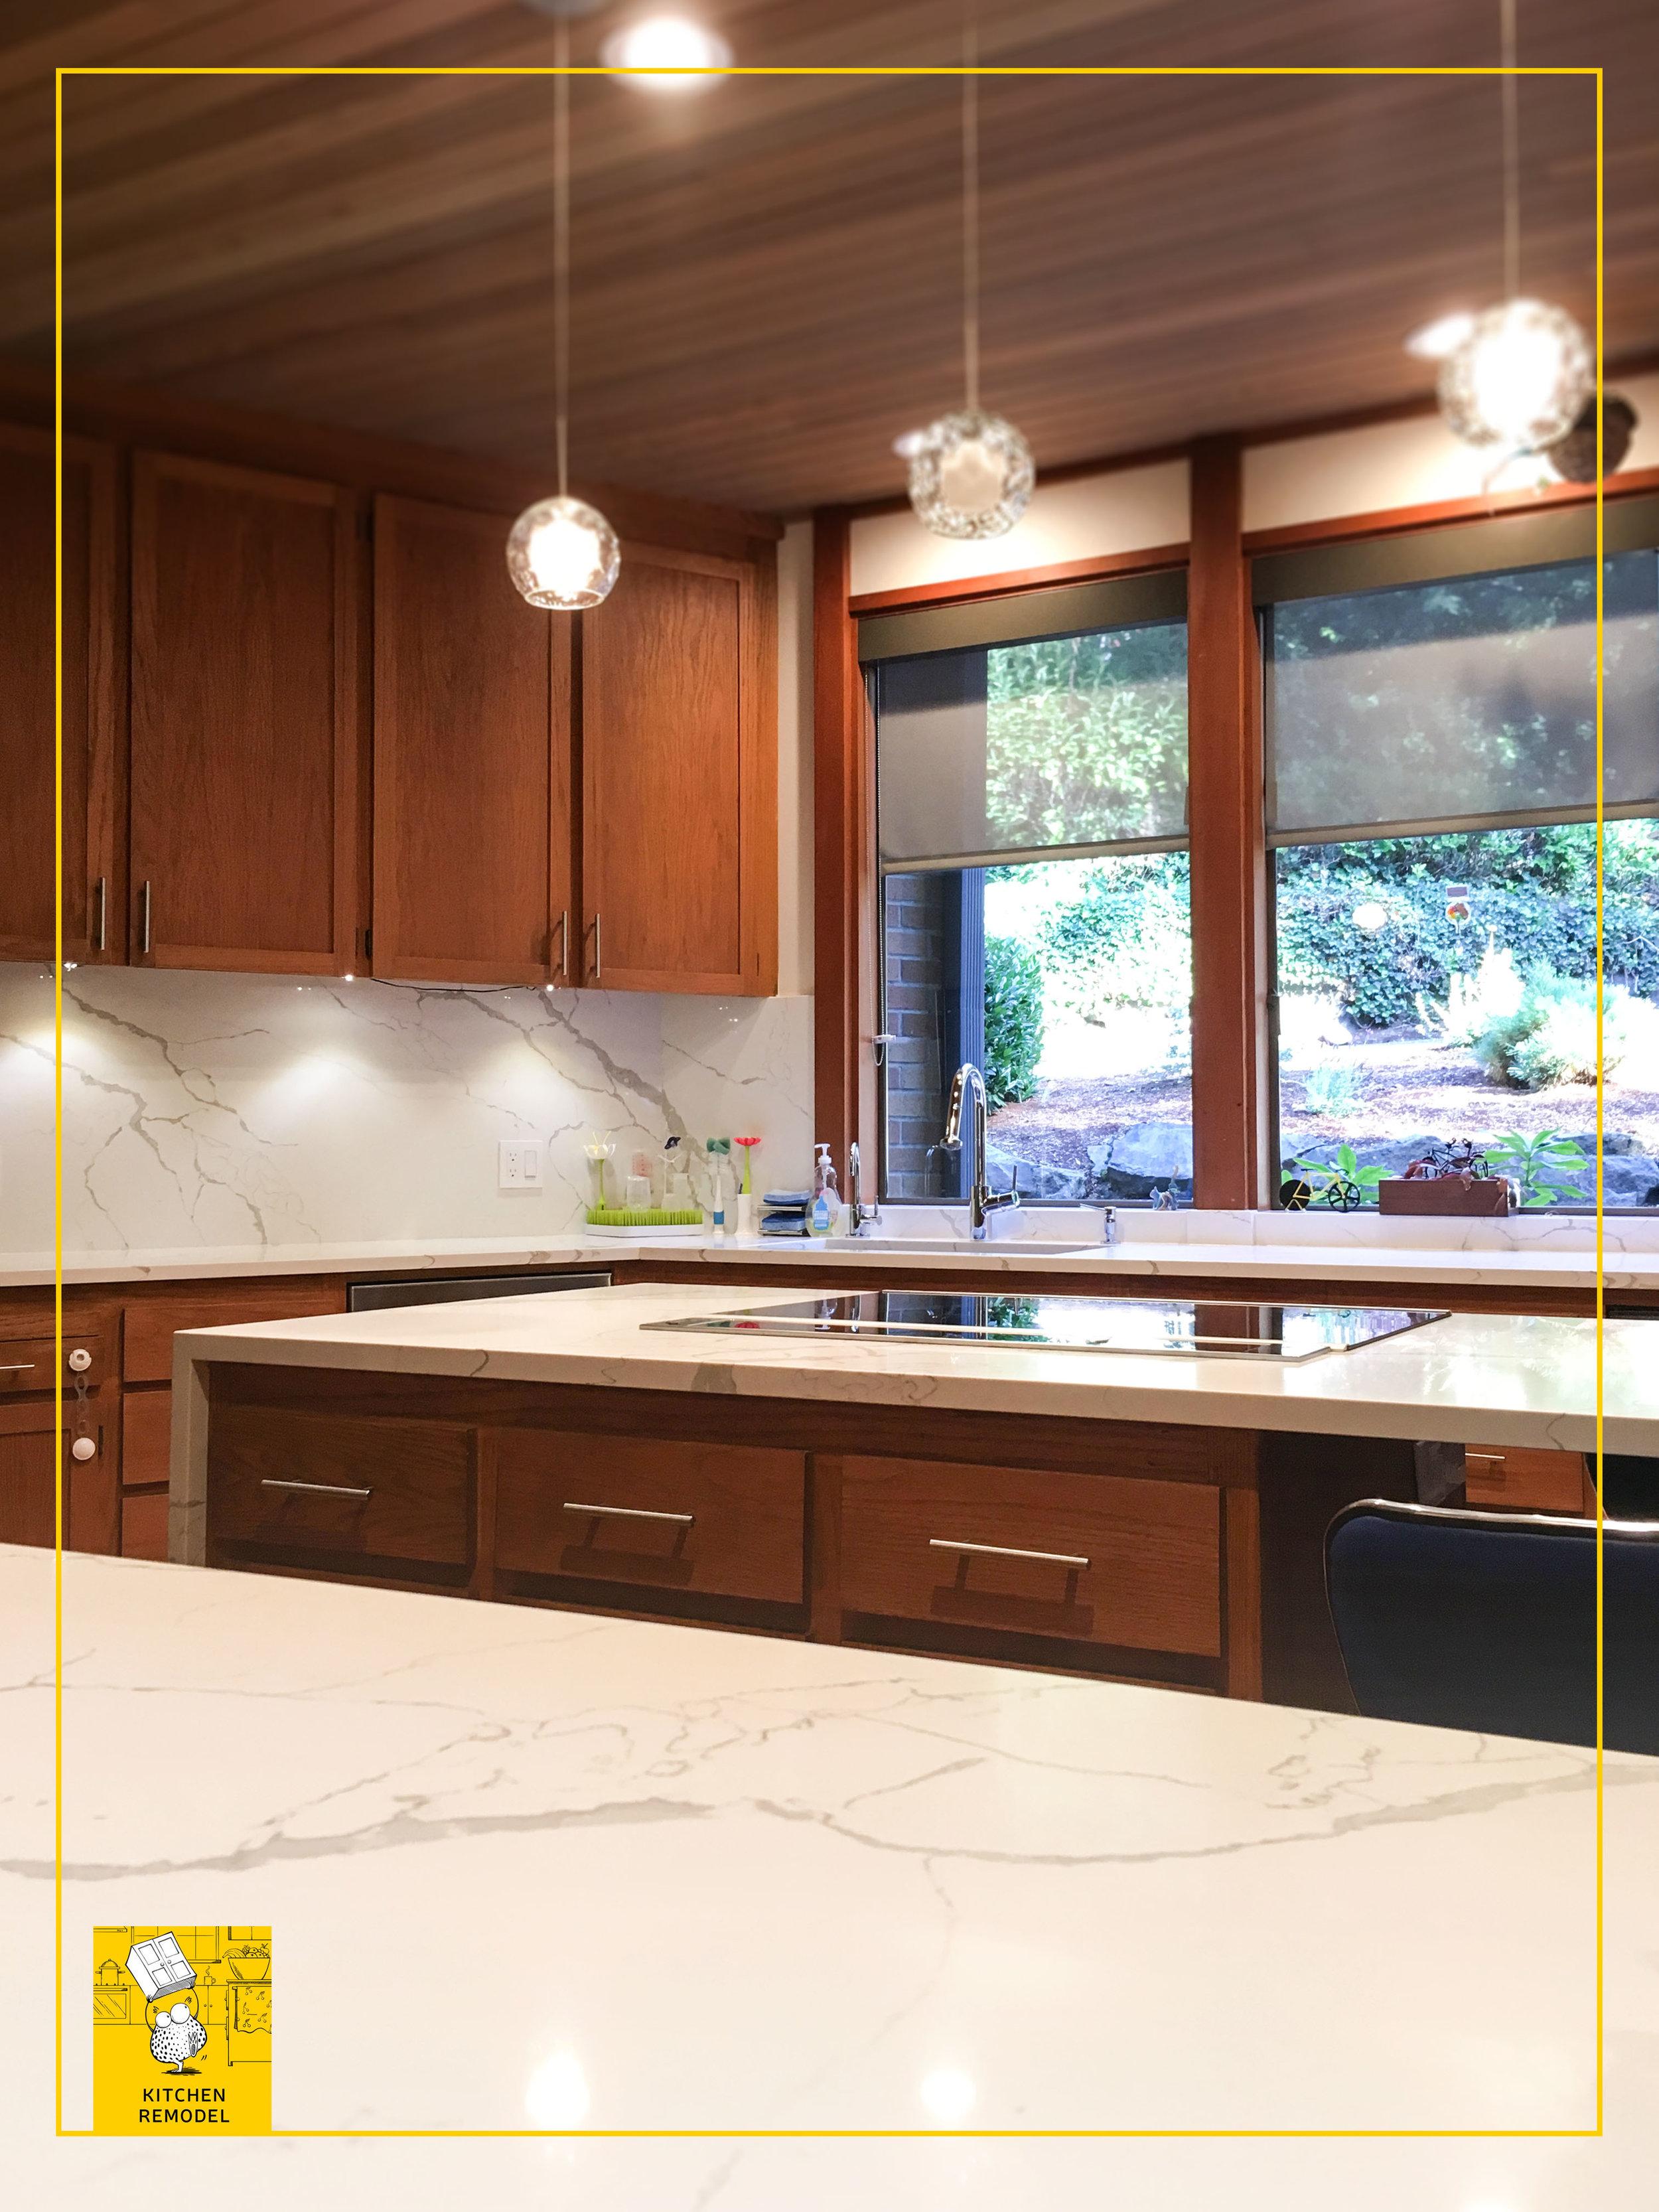 MT family kitchen remodel 05.jpg